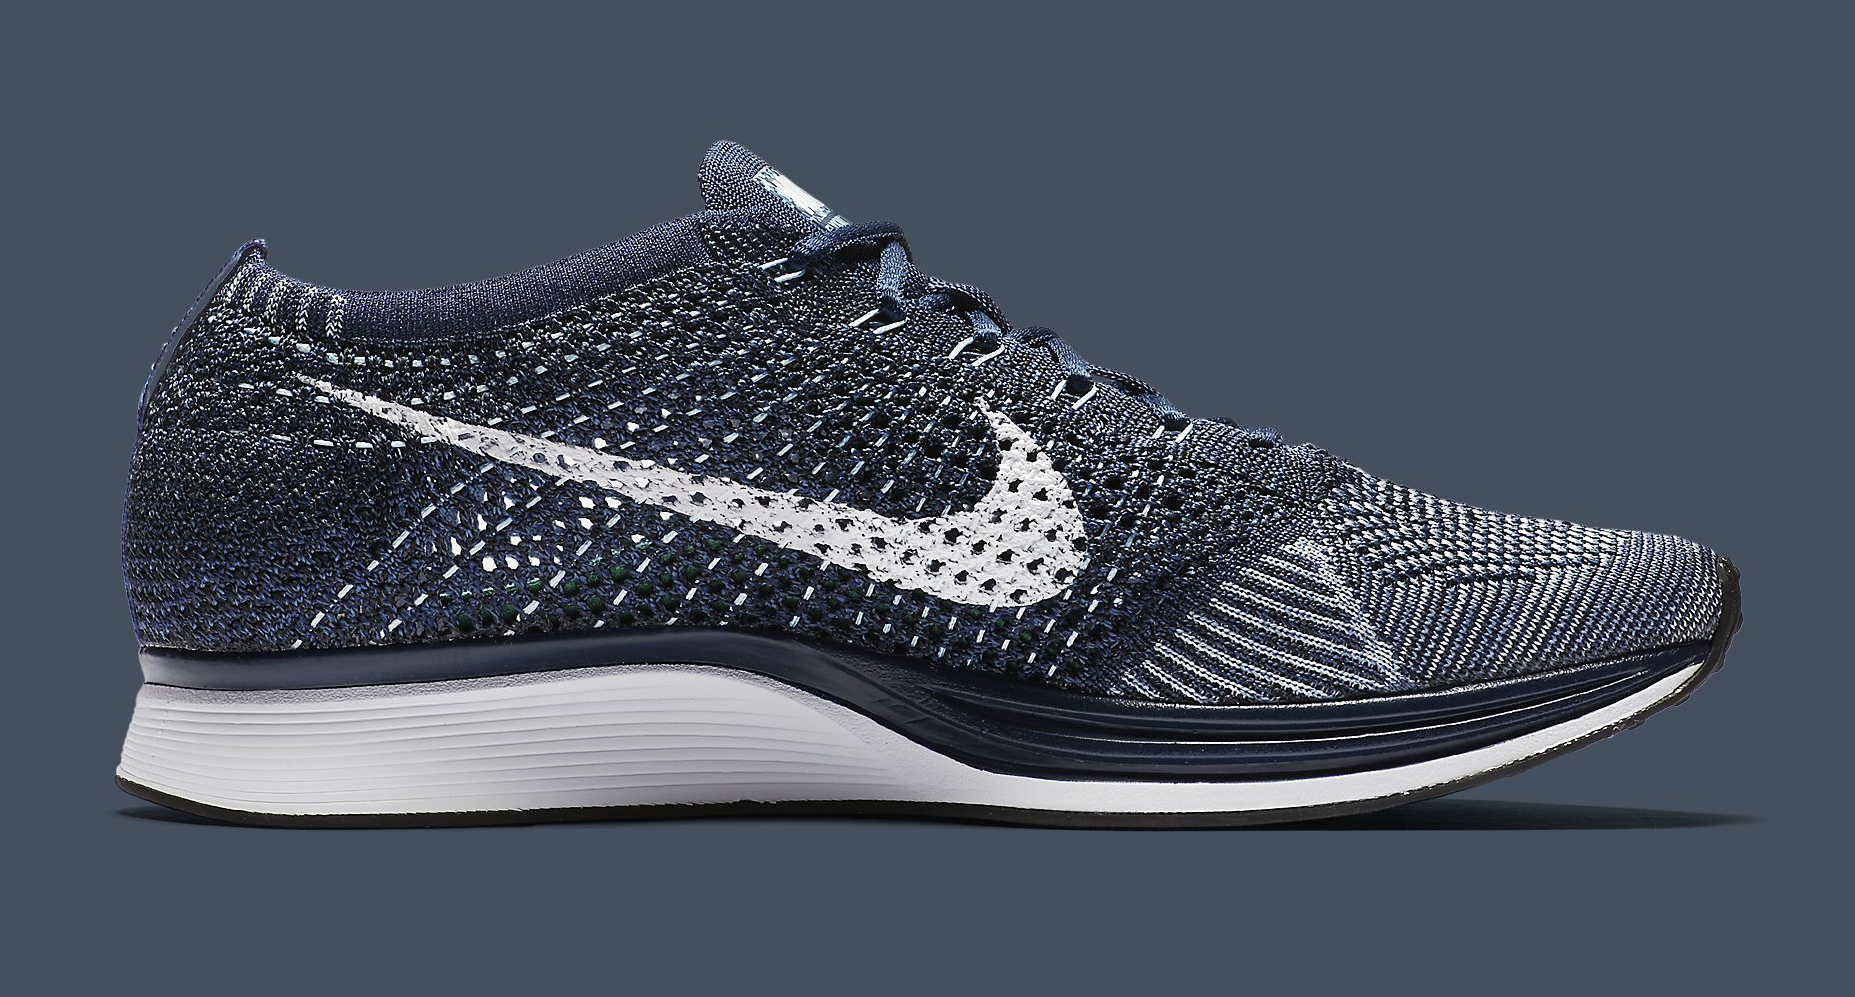 new style 45476 72025 Image via Nike Nike Flyknit Racer Blue Tint White 862713-401 Medial